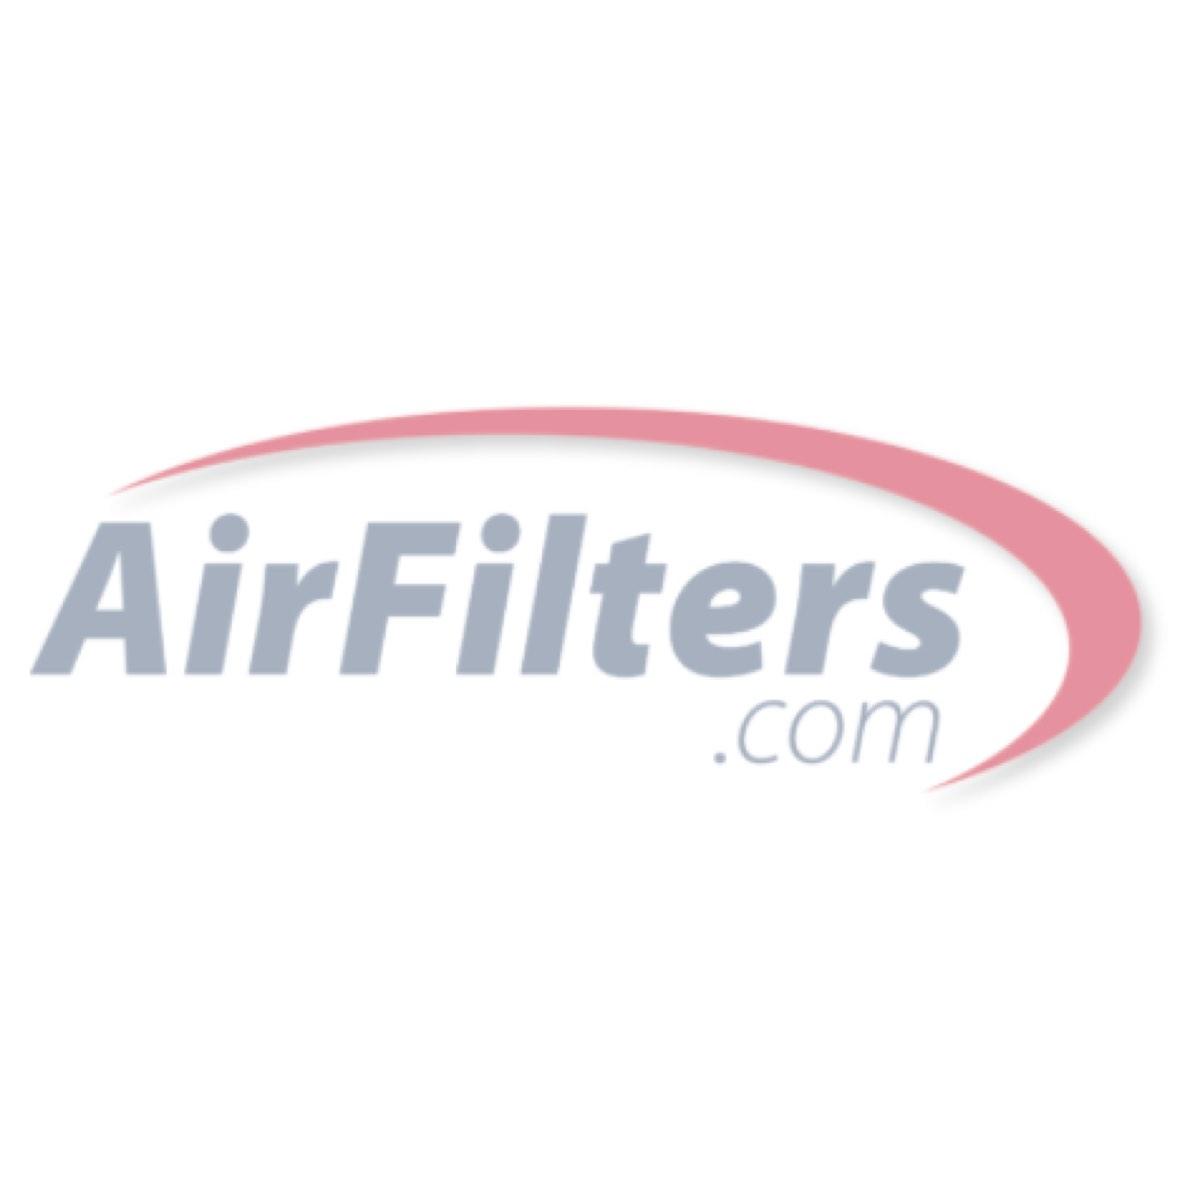 Filter Queen® Defender 3000 Aftermarket Air Purifier Filters